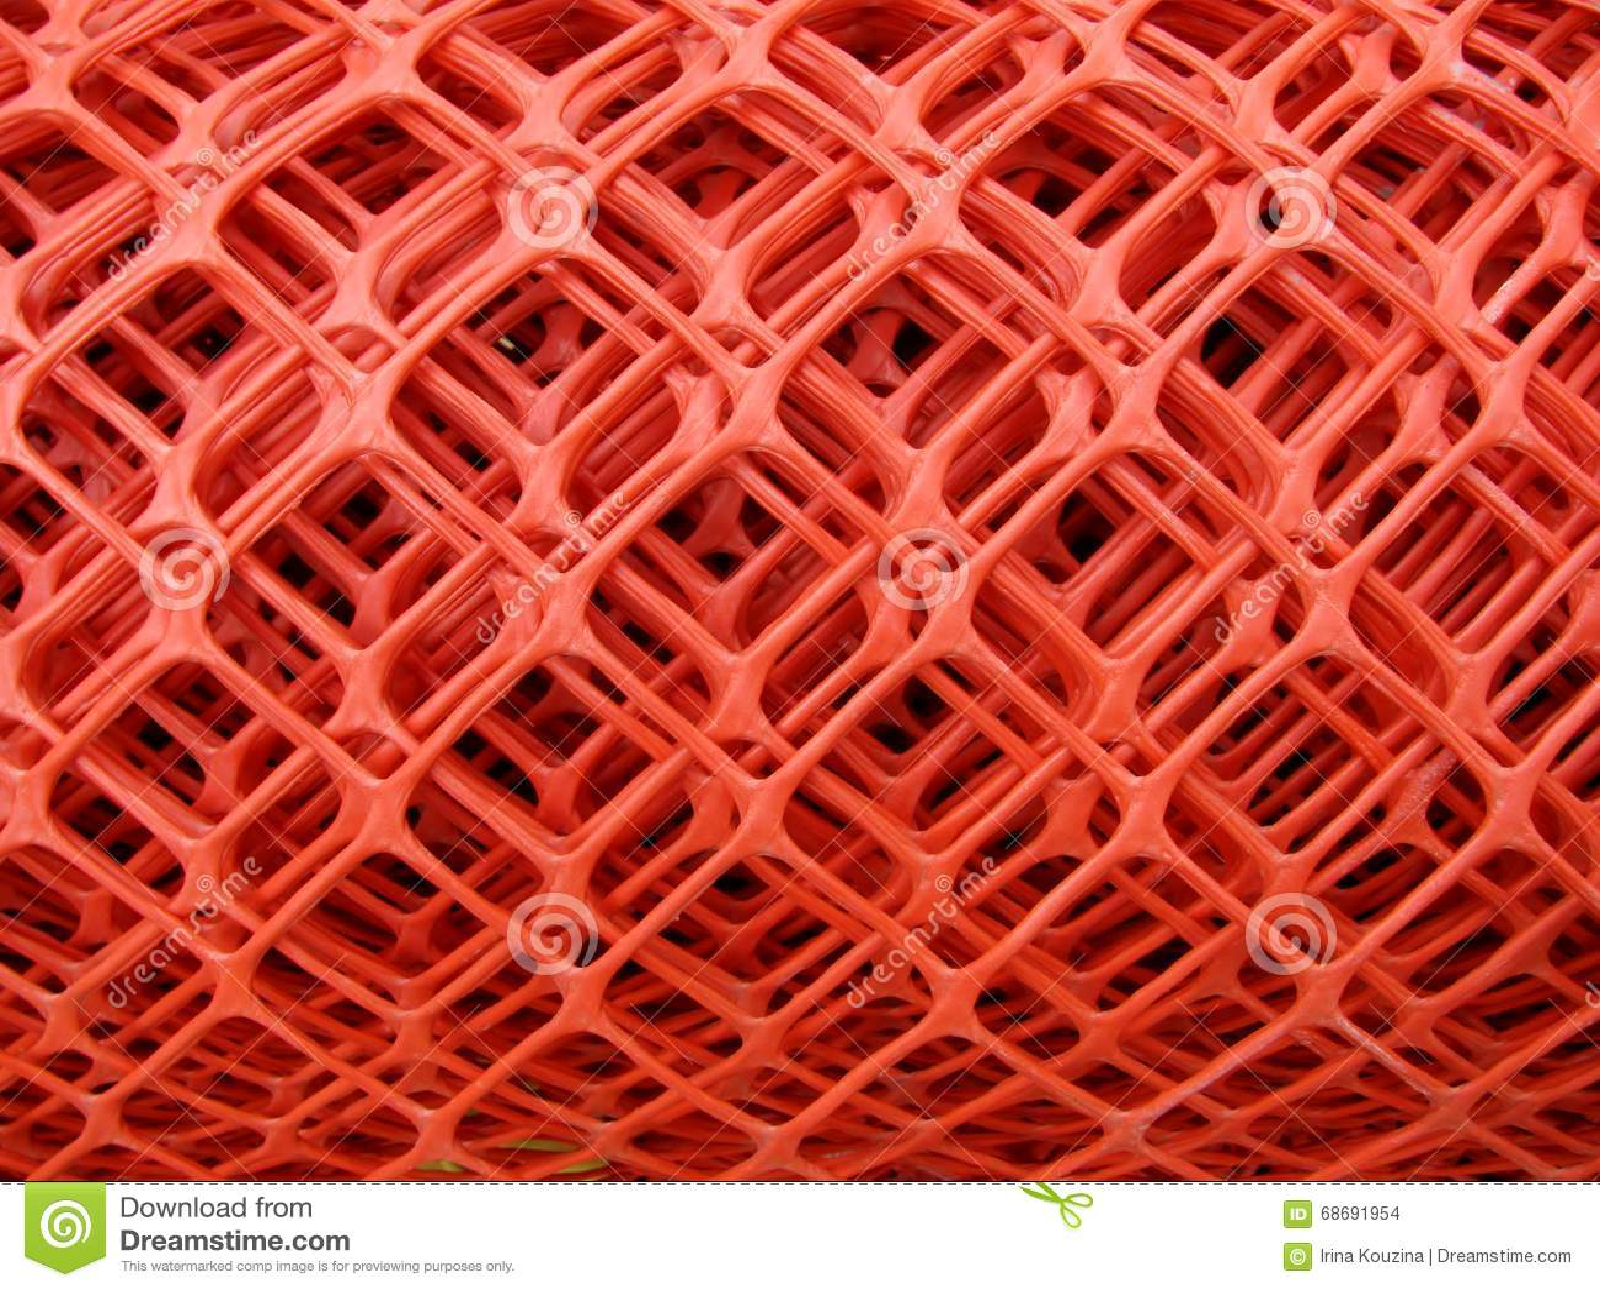 rolls of plastic fence mesh